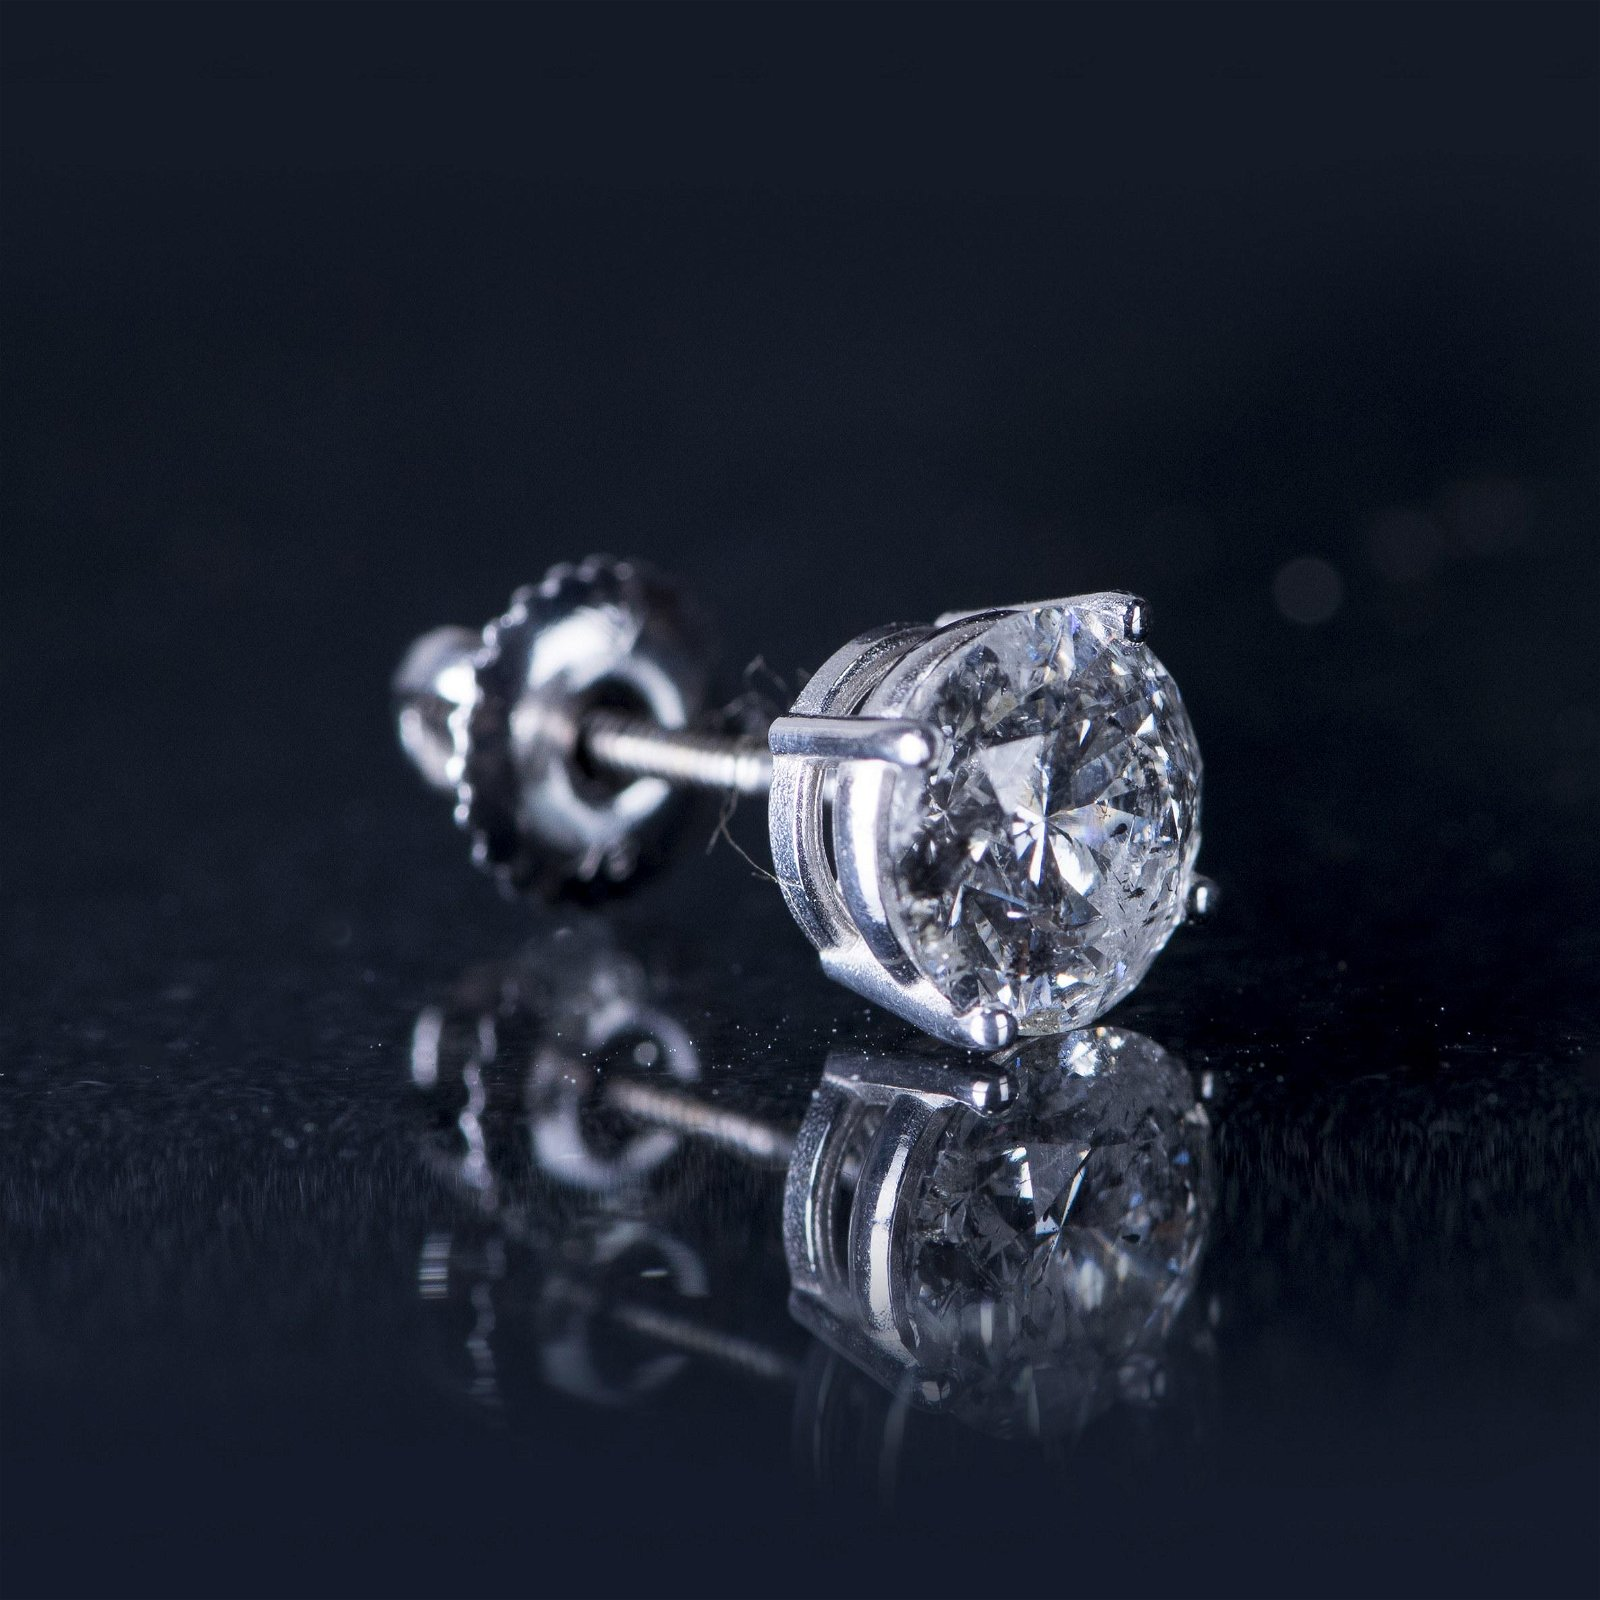 A PAIR OF DIAMOND STUD EARRINGS, AIGL CERTIFIED